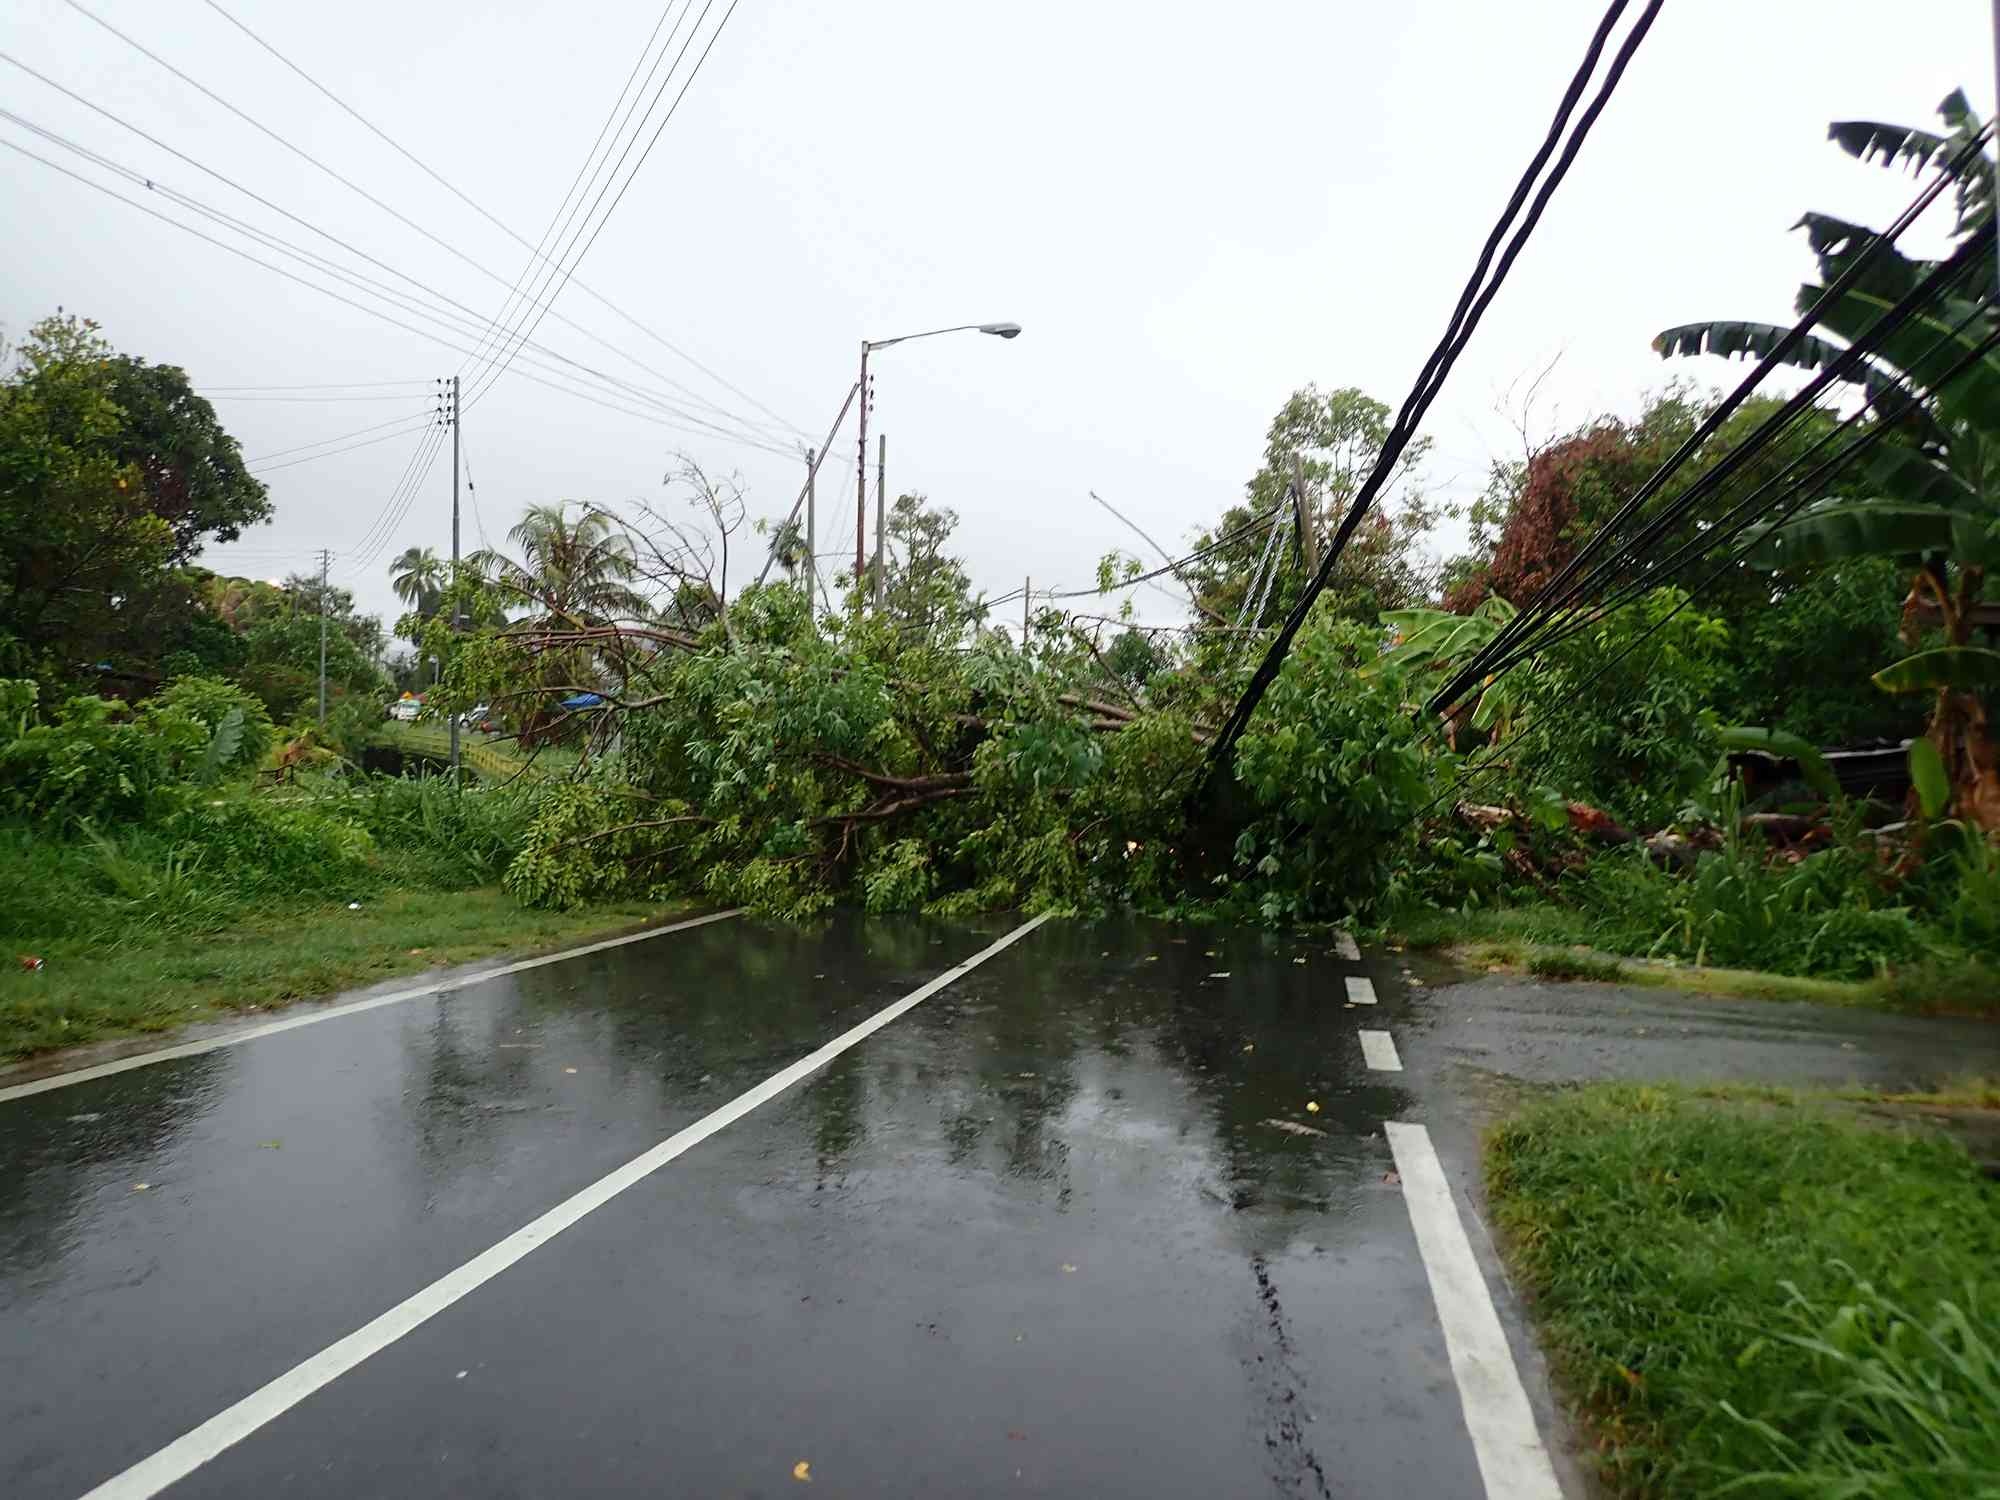 Fallen tree in Kota Kinabalu, Borneo